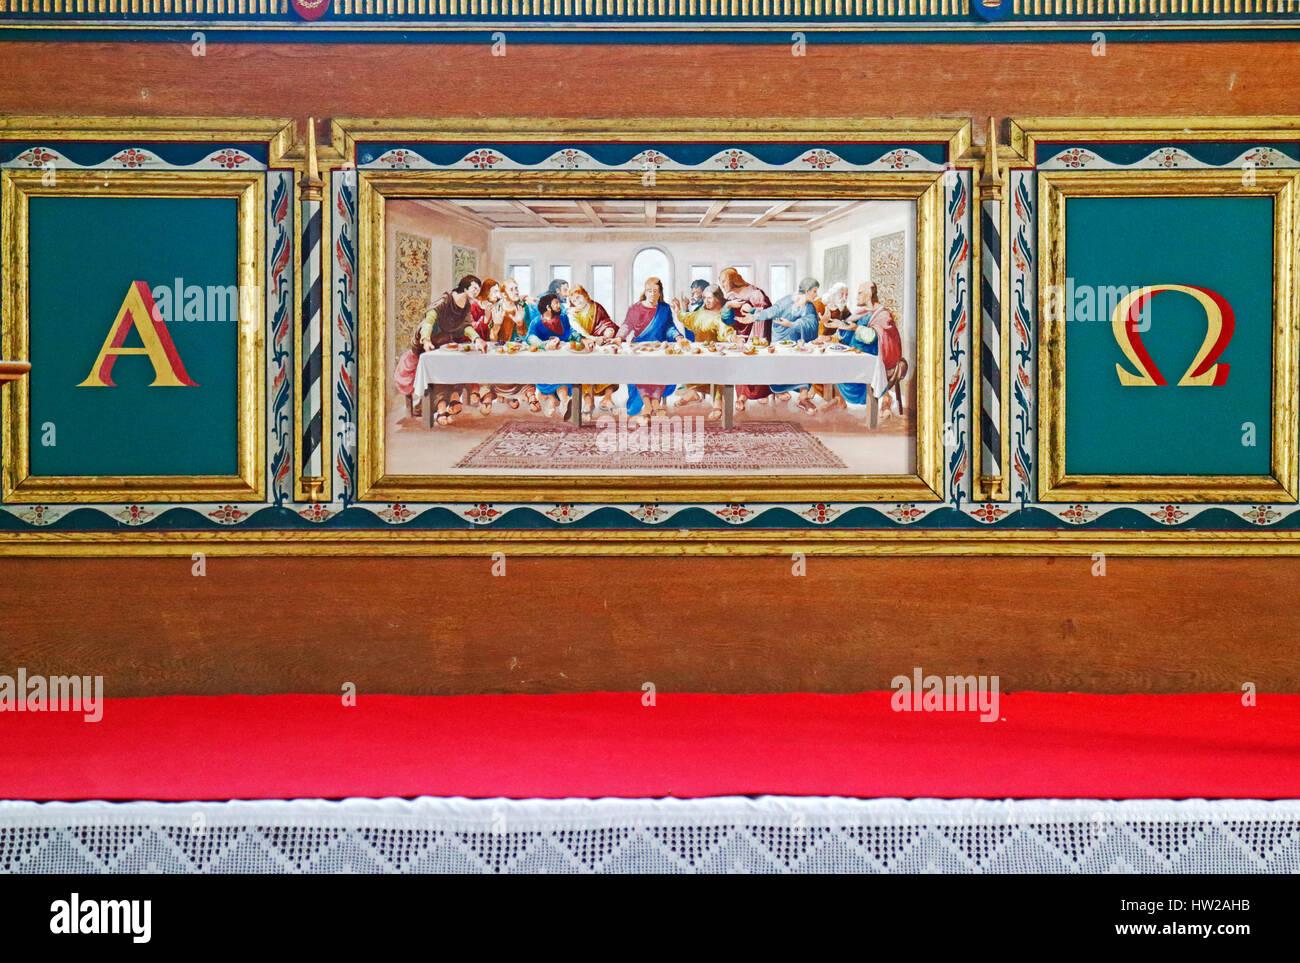 Reredos in the parish church of St John the Baptist at Stiffkey, Norfolk, England, United Kingdom. Stock Photo